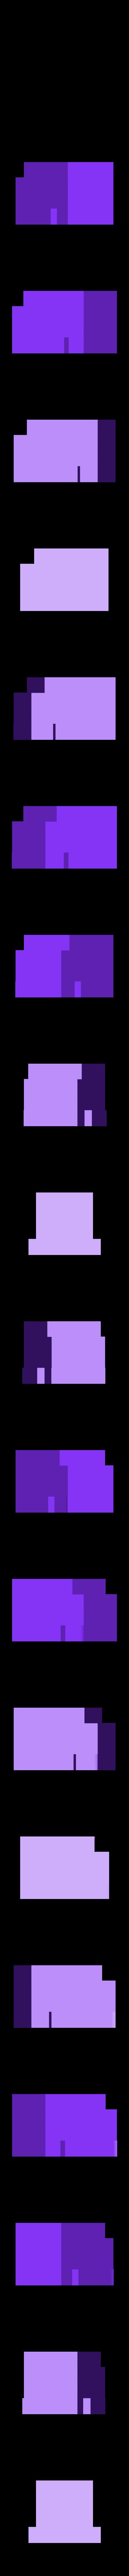 MakerBot_-_Rear_Engine-_SCALED-1.STL Download free STL file 4-8-8-4 Big Boy Locomotive • 3D printer object, RaymondDeLuca